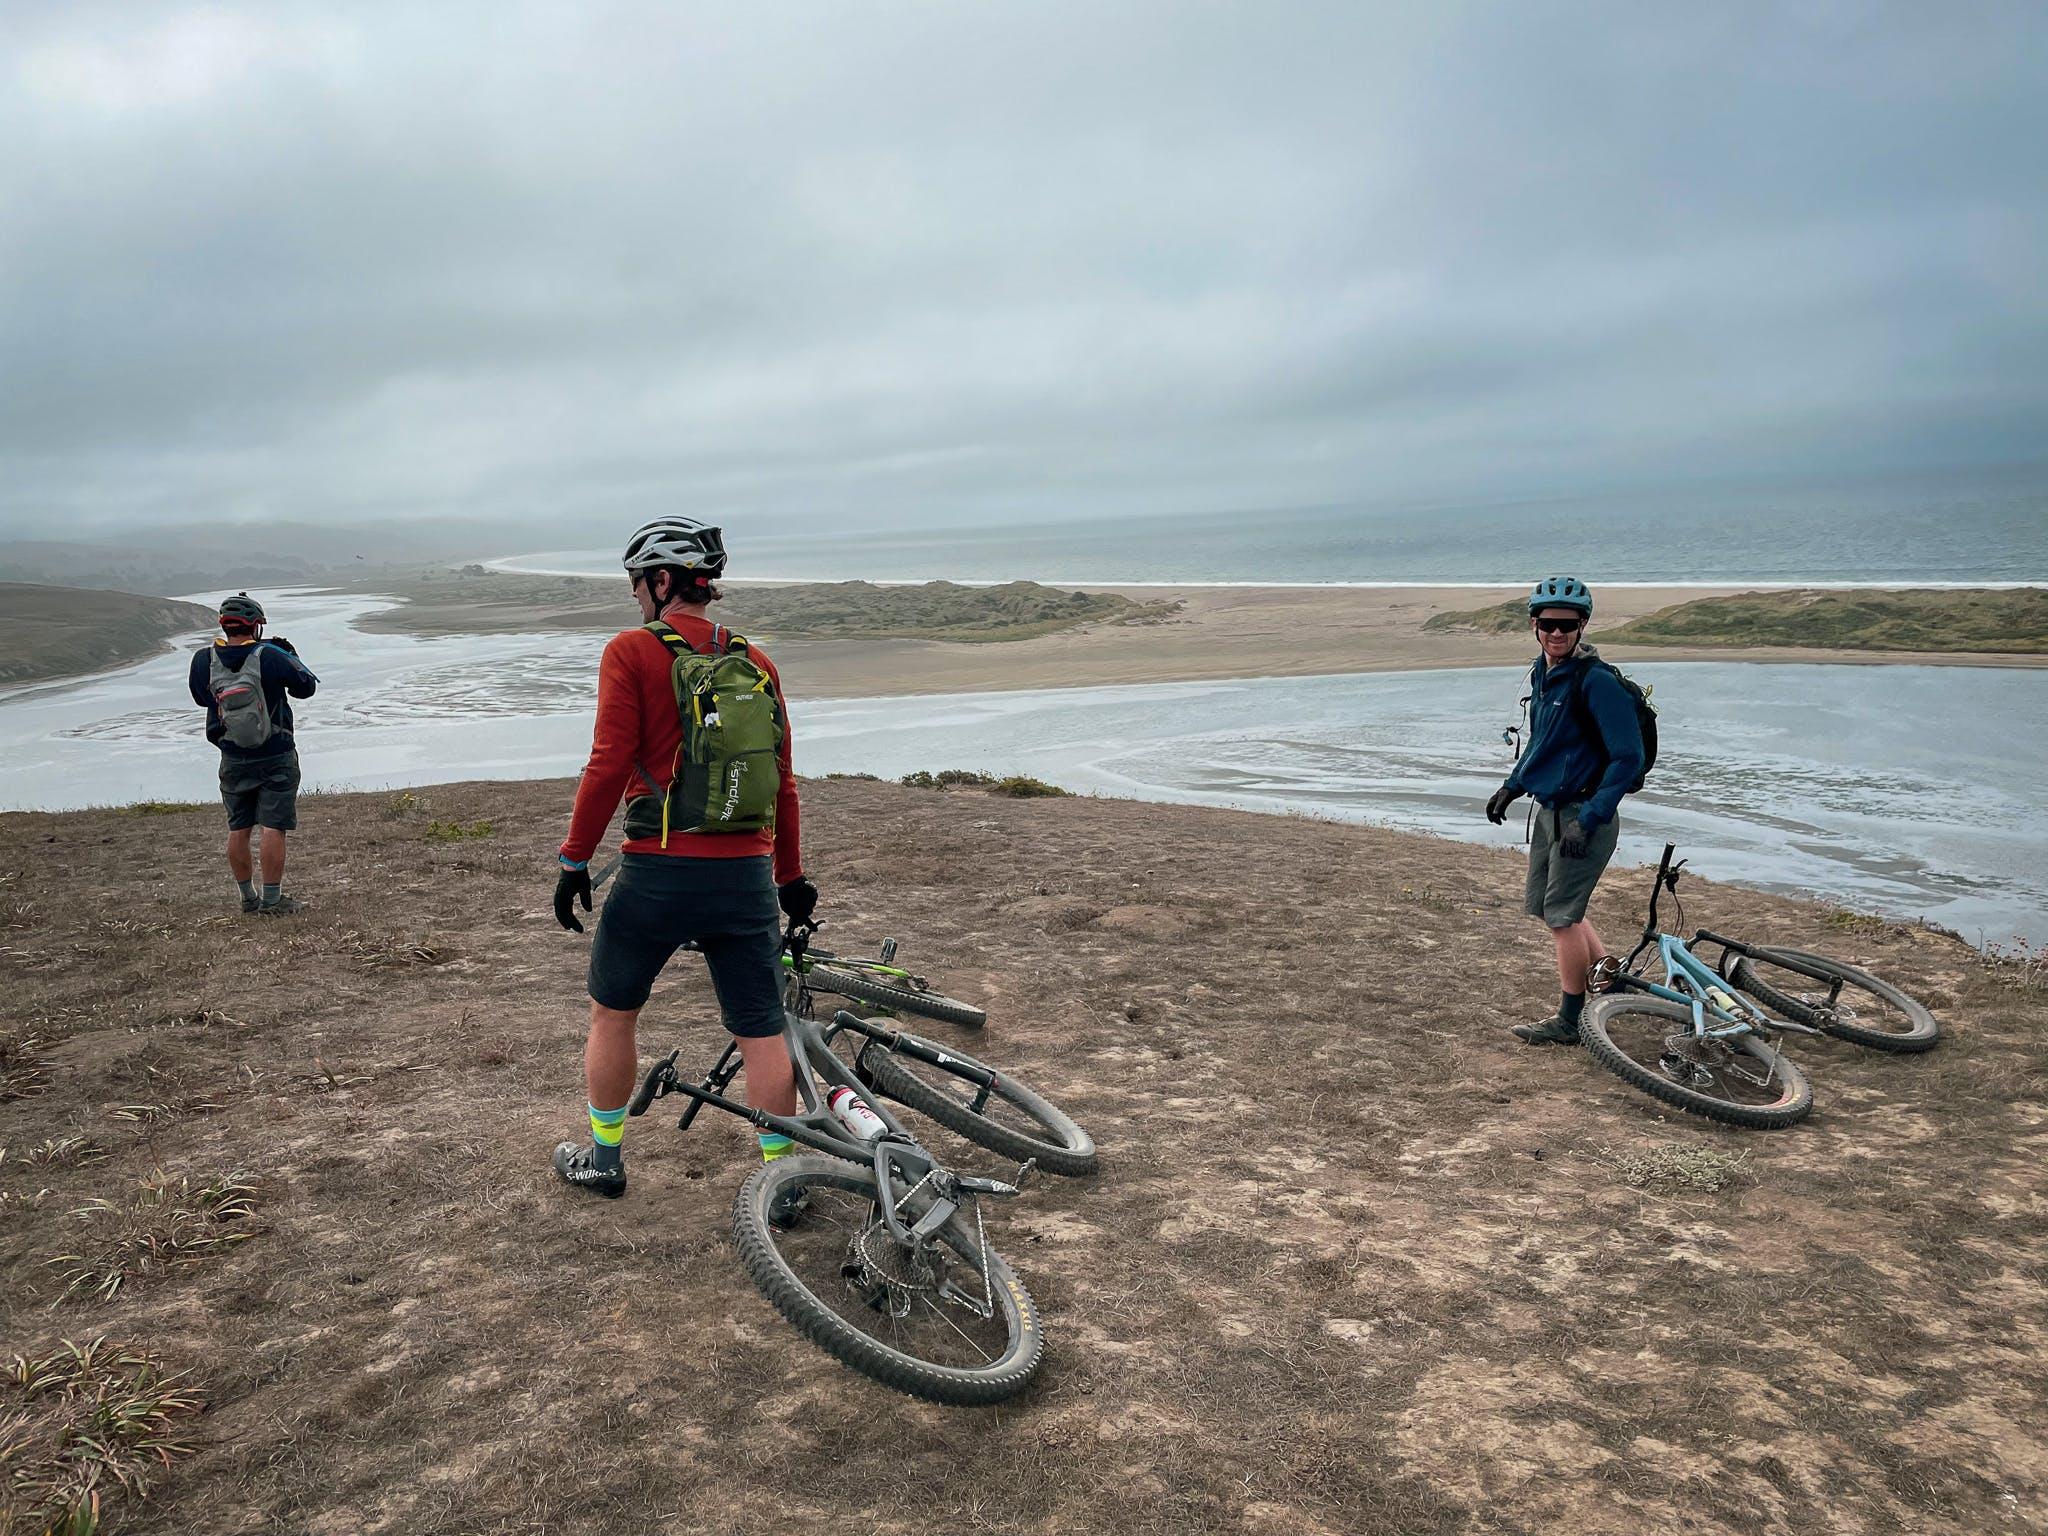 Mountain bikers at Drakes Head Point Reyes